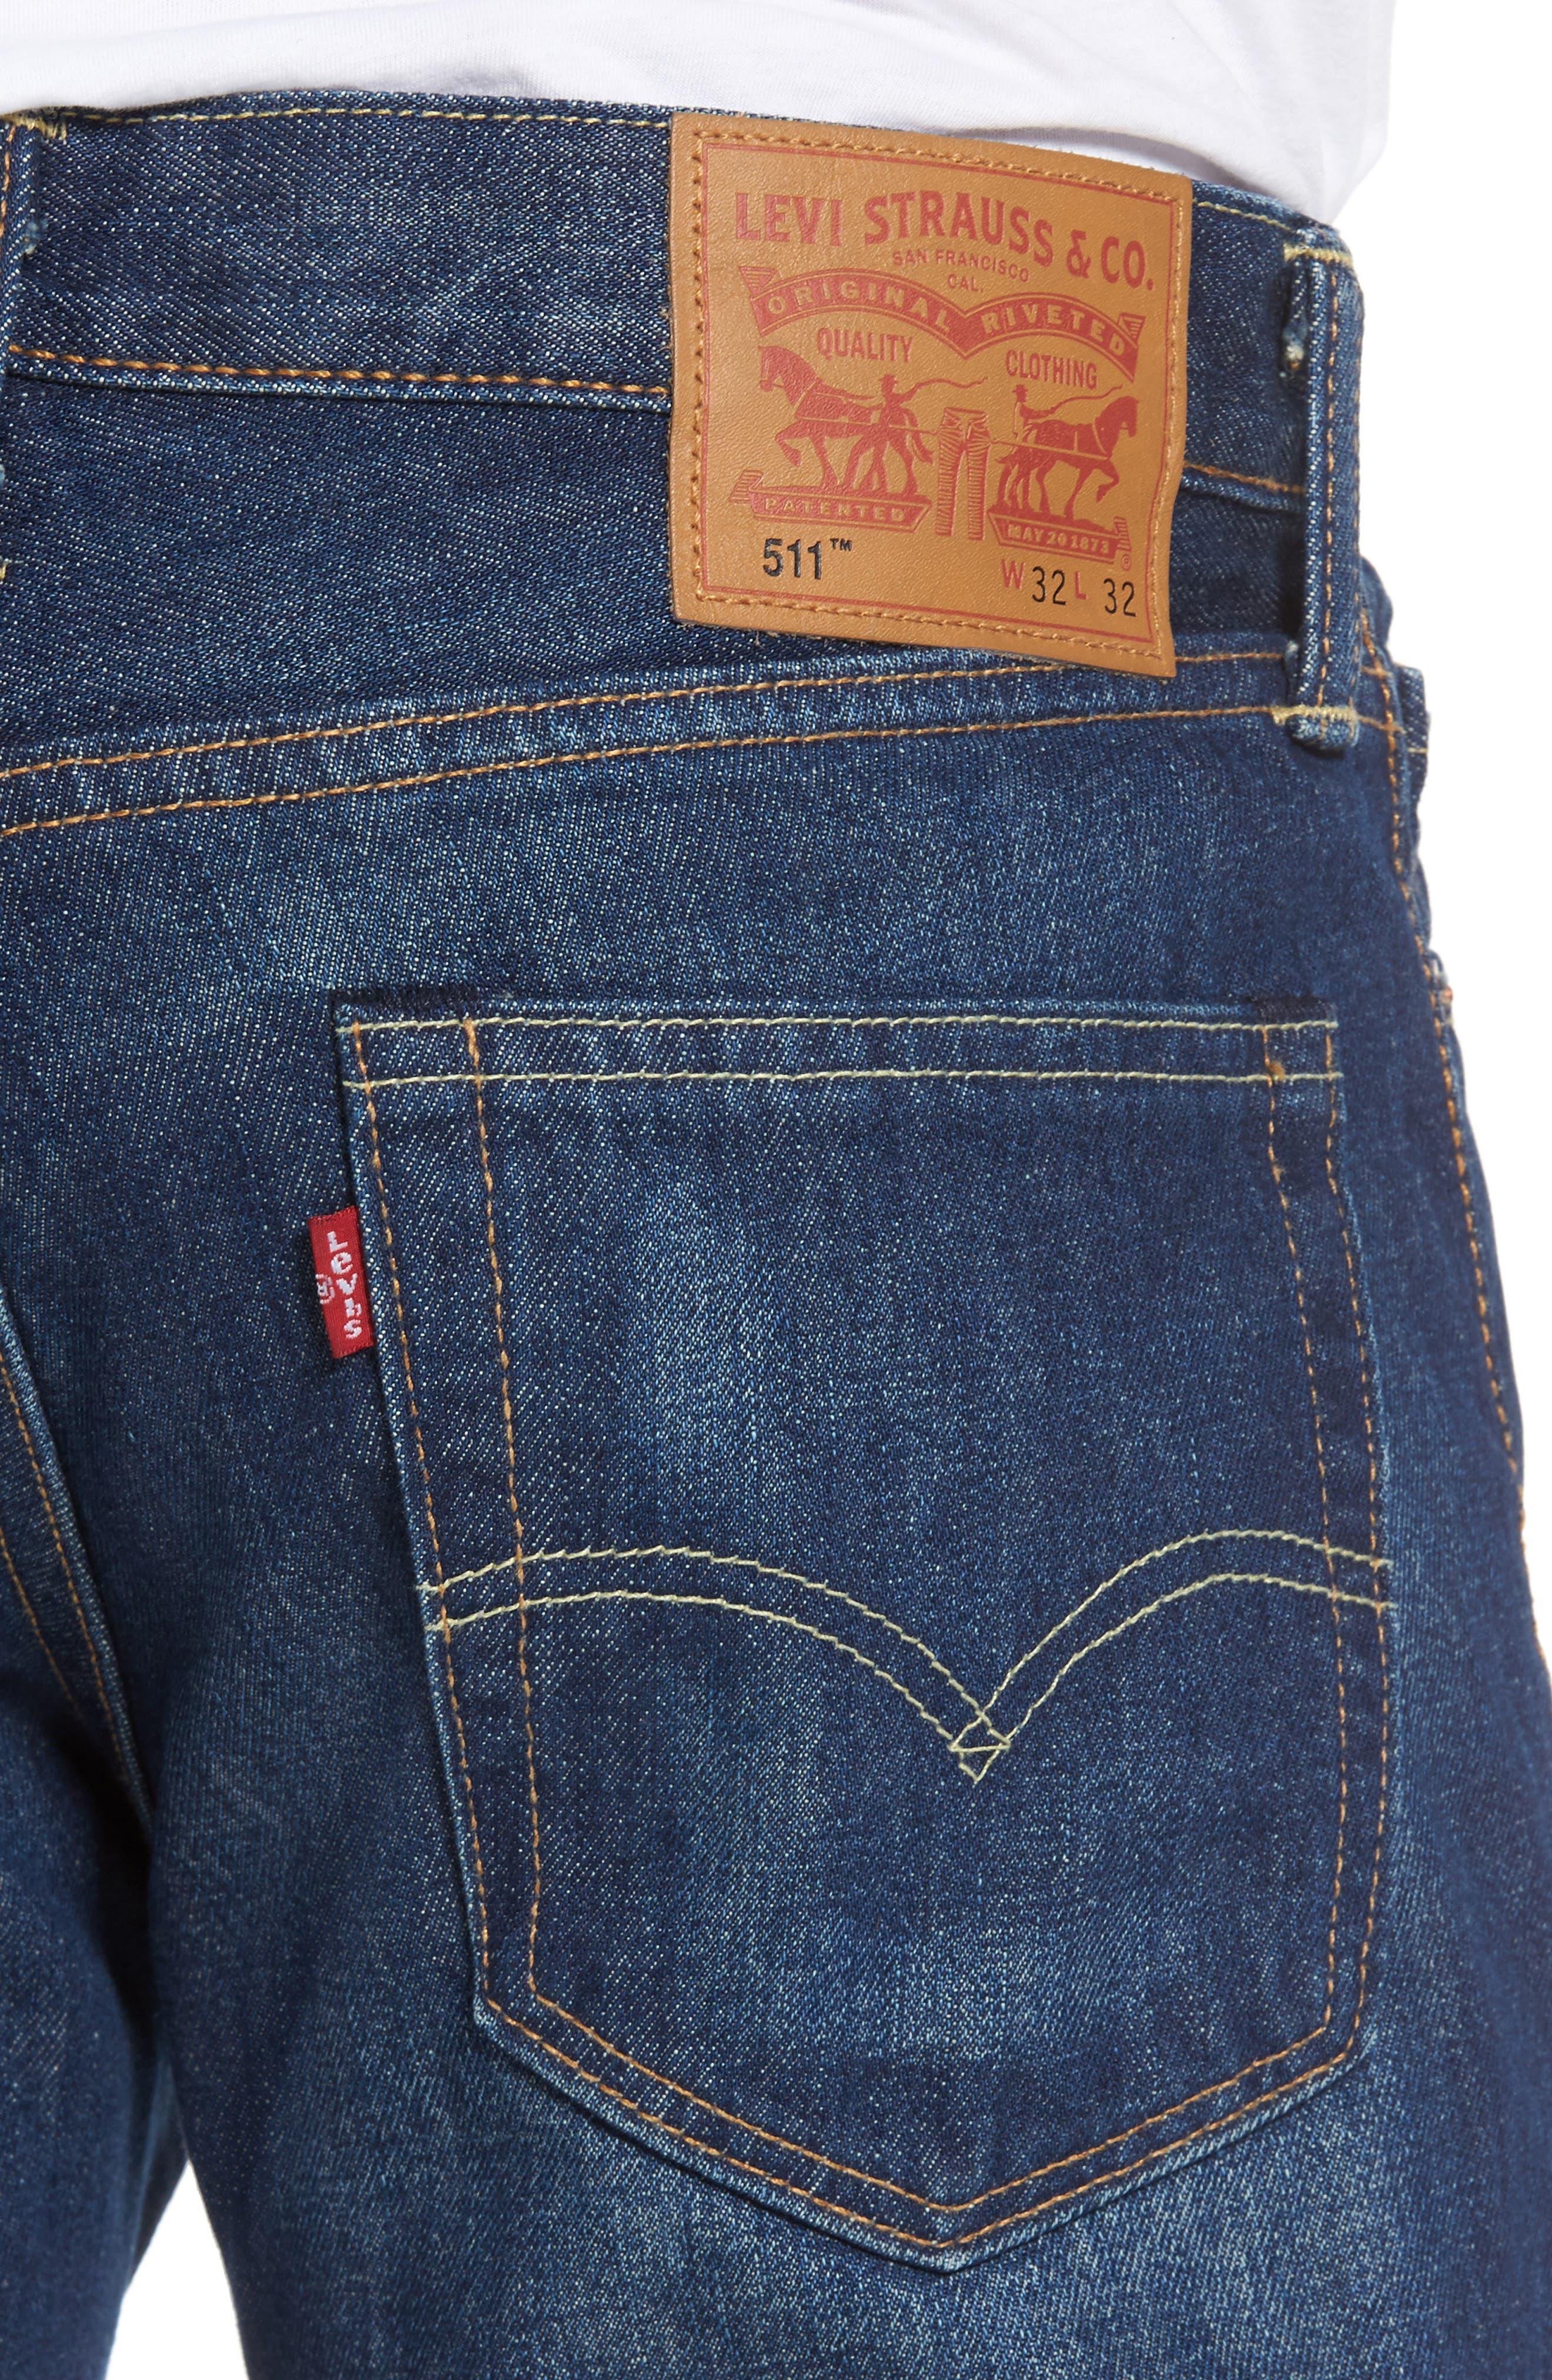 511<sup>™</sup> Slim Fit Jeans,                             Alternate thumbnail 4, color,                             DARK AUTHENTIC